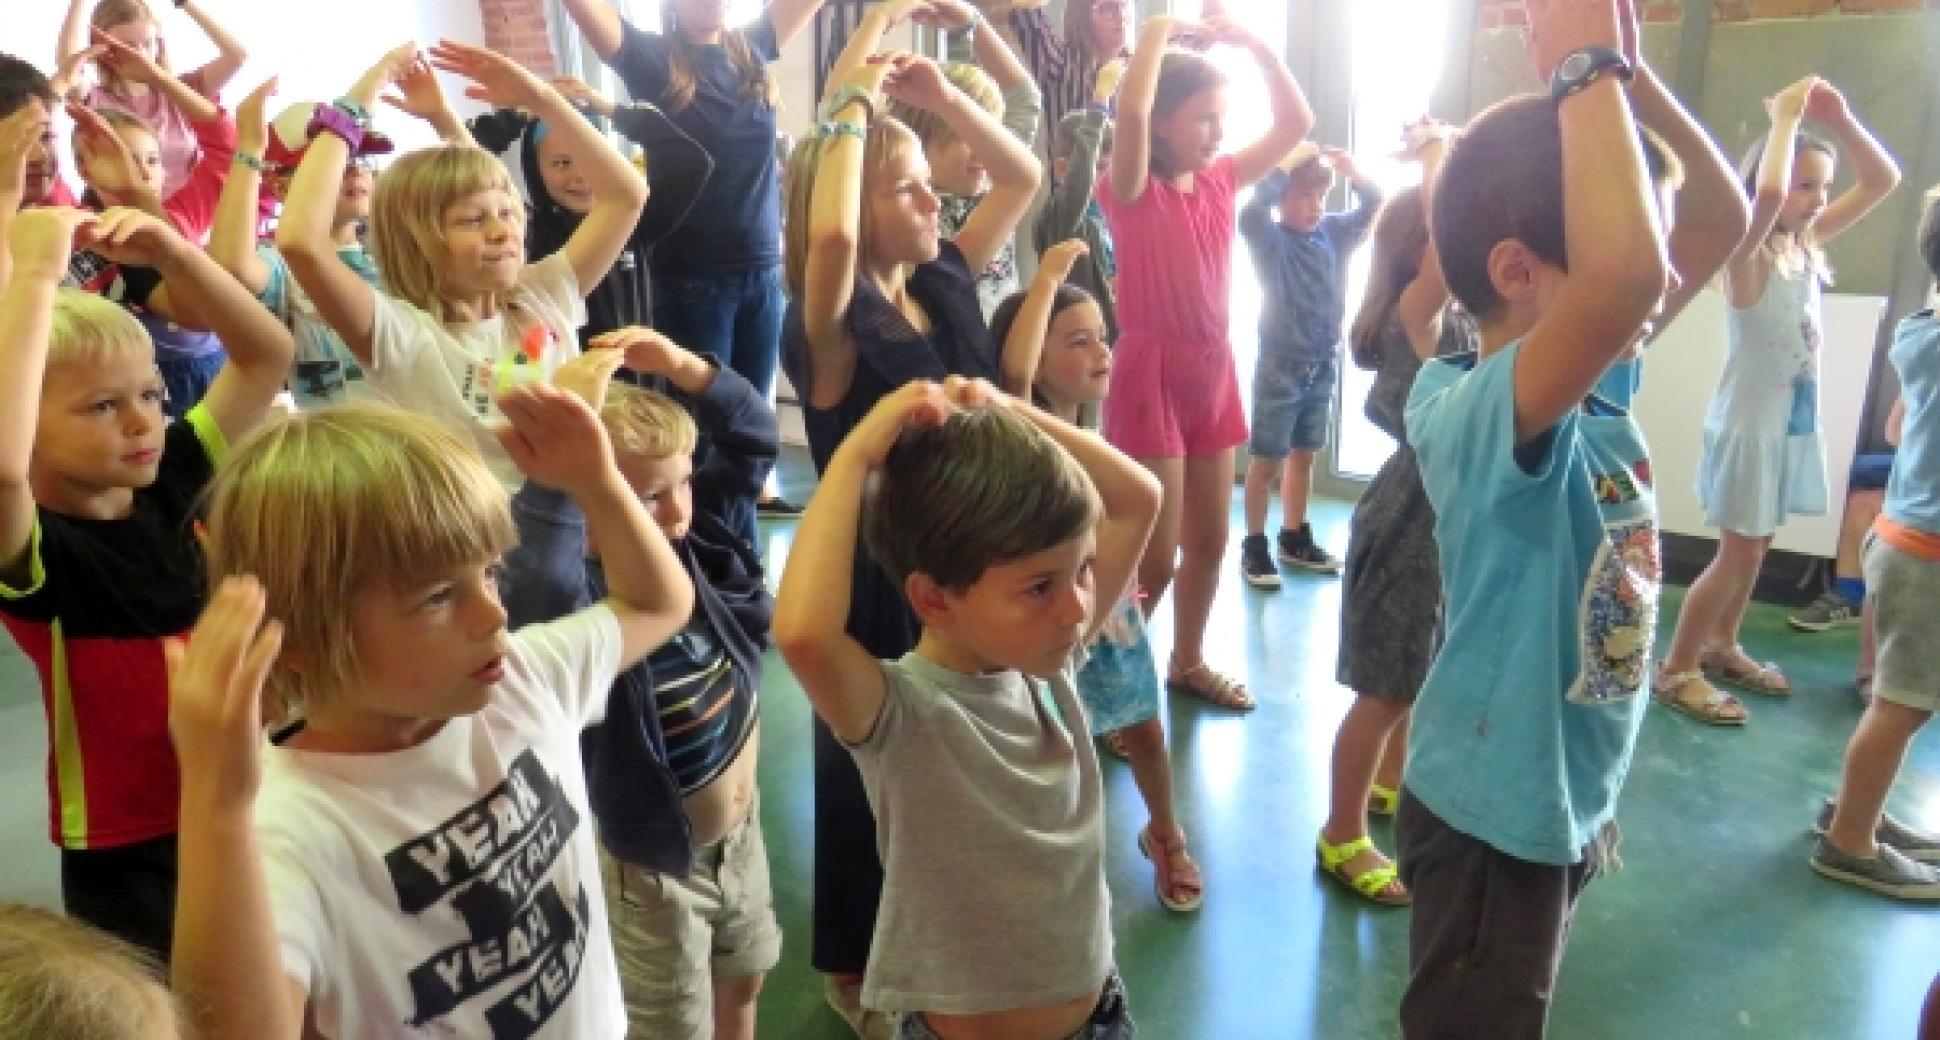 Dolle juniordagen: Miniolympics